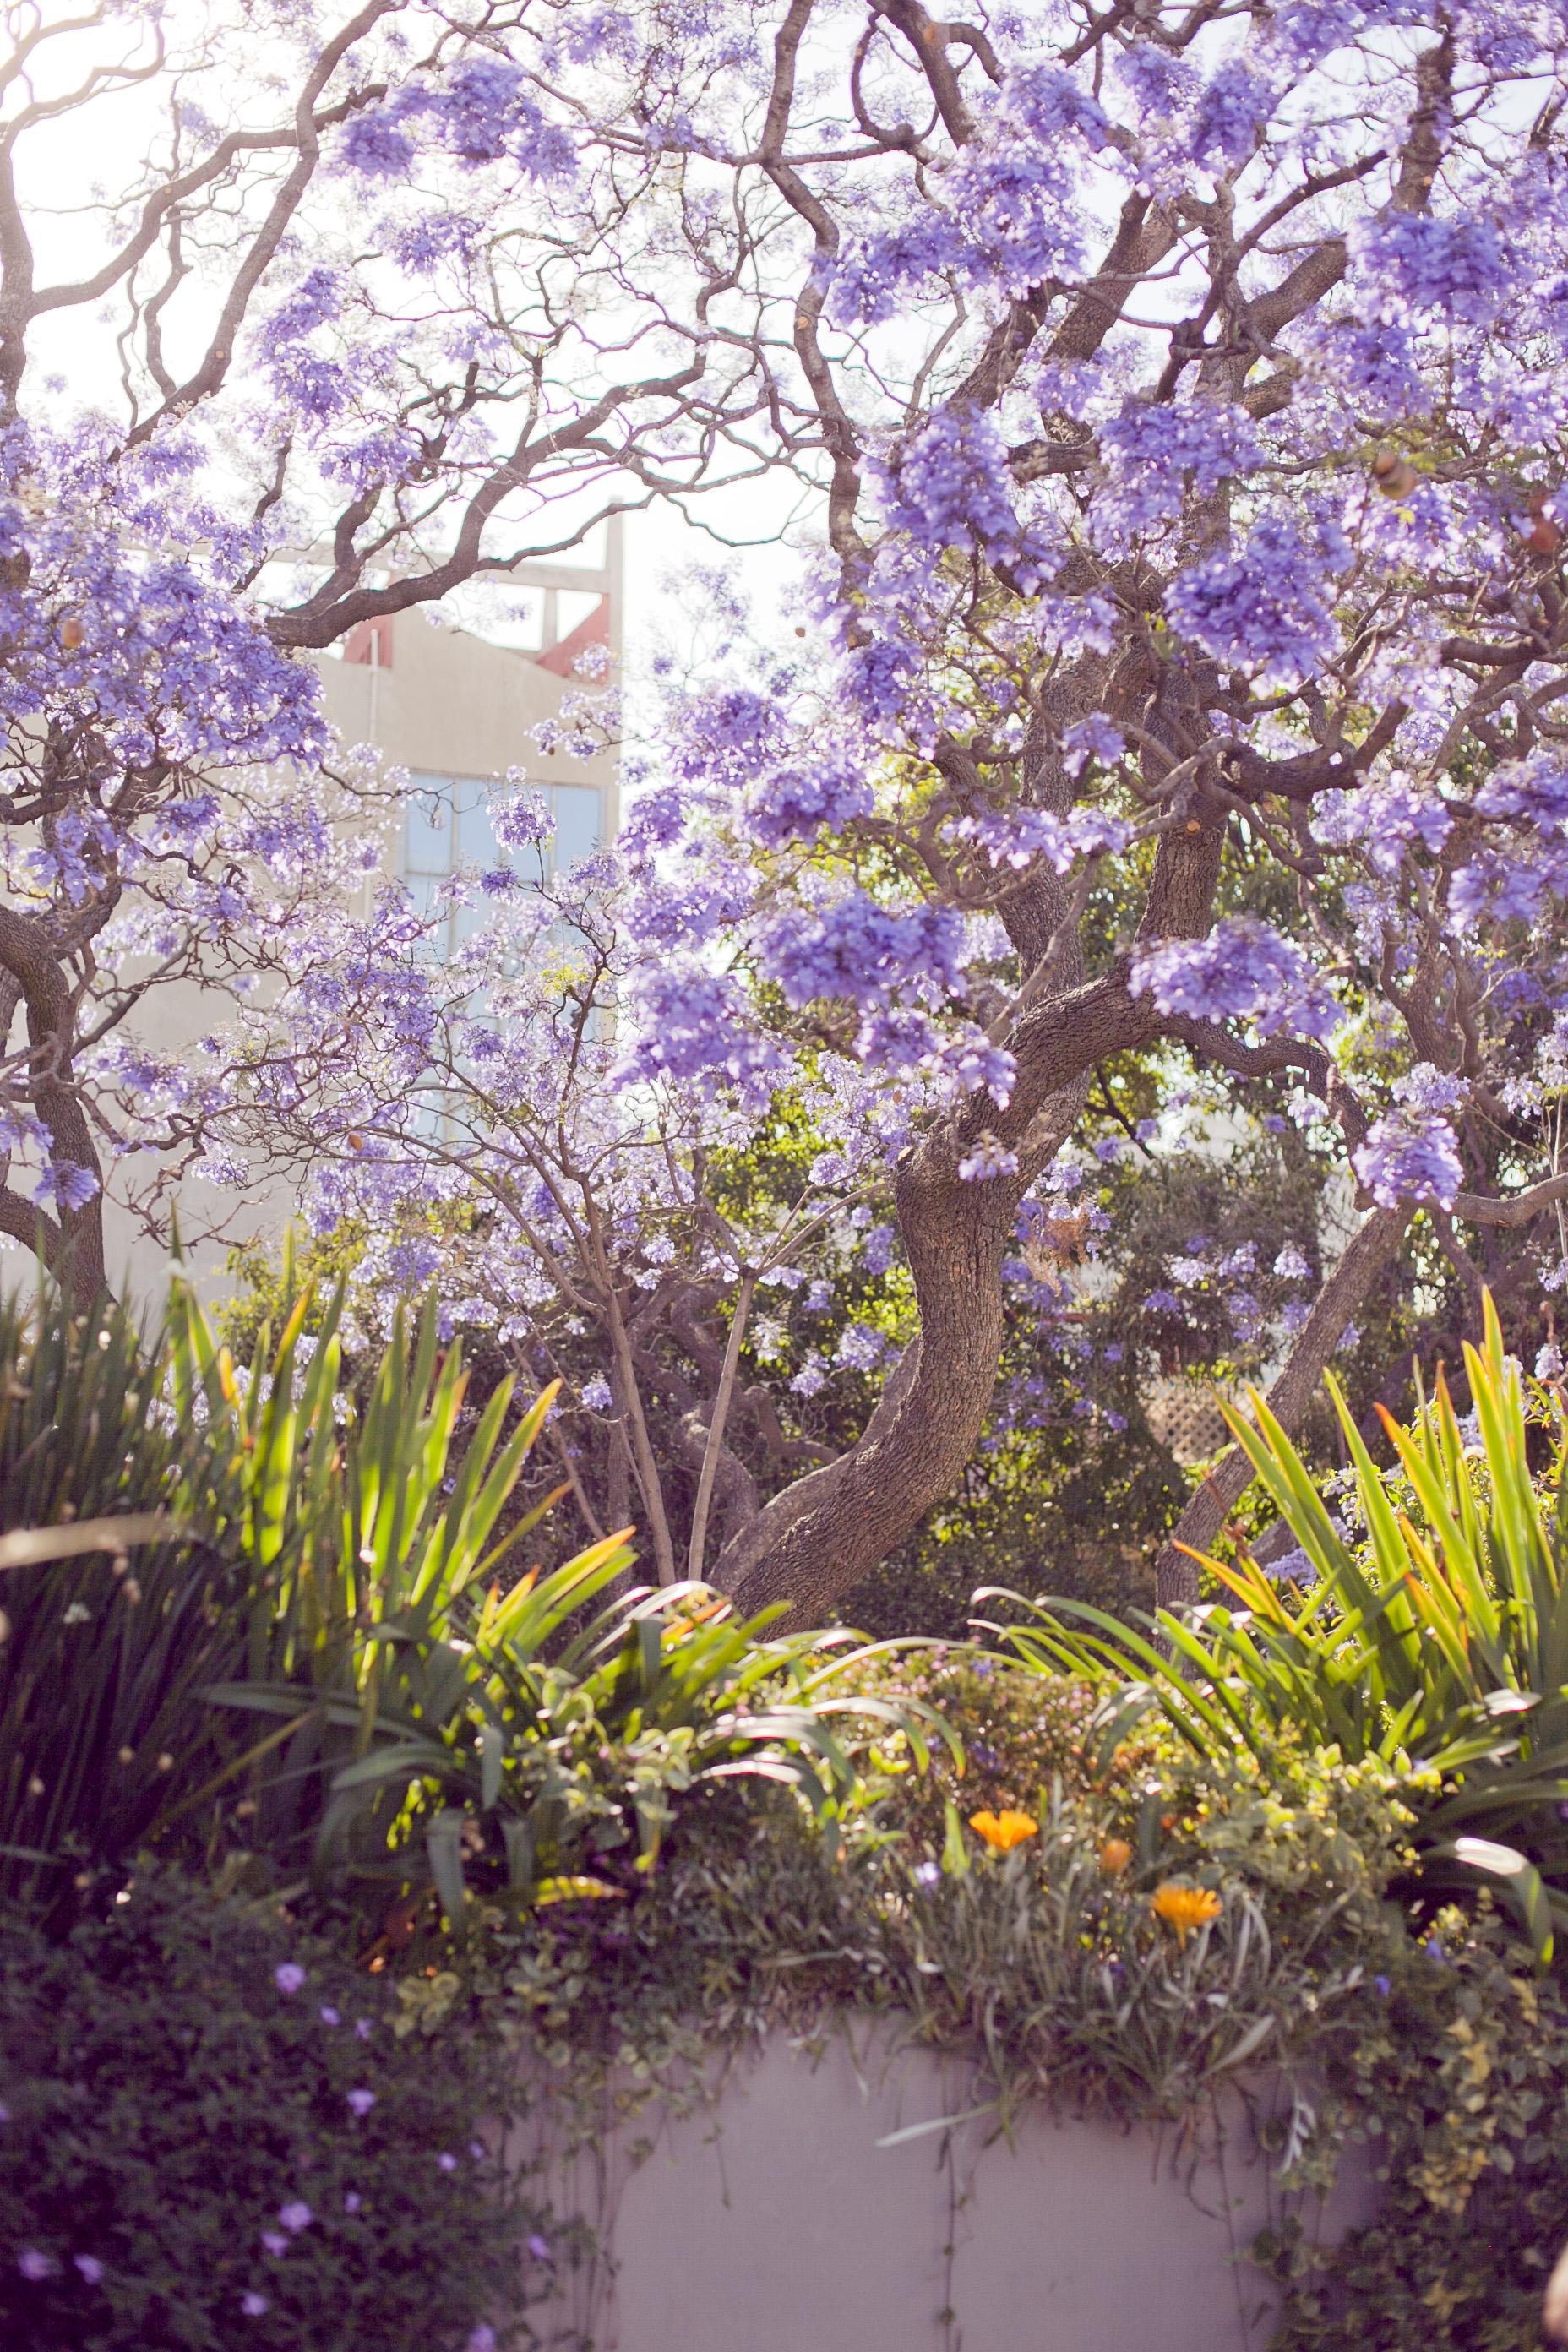 Copy of jacaranda tree in bloom